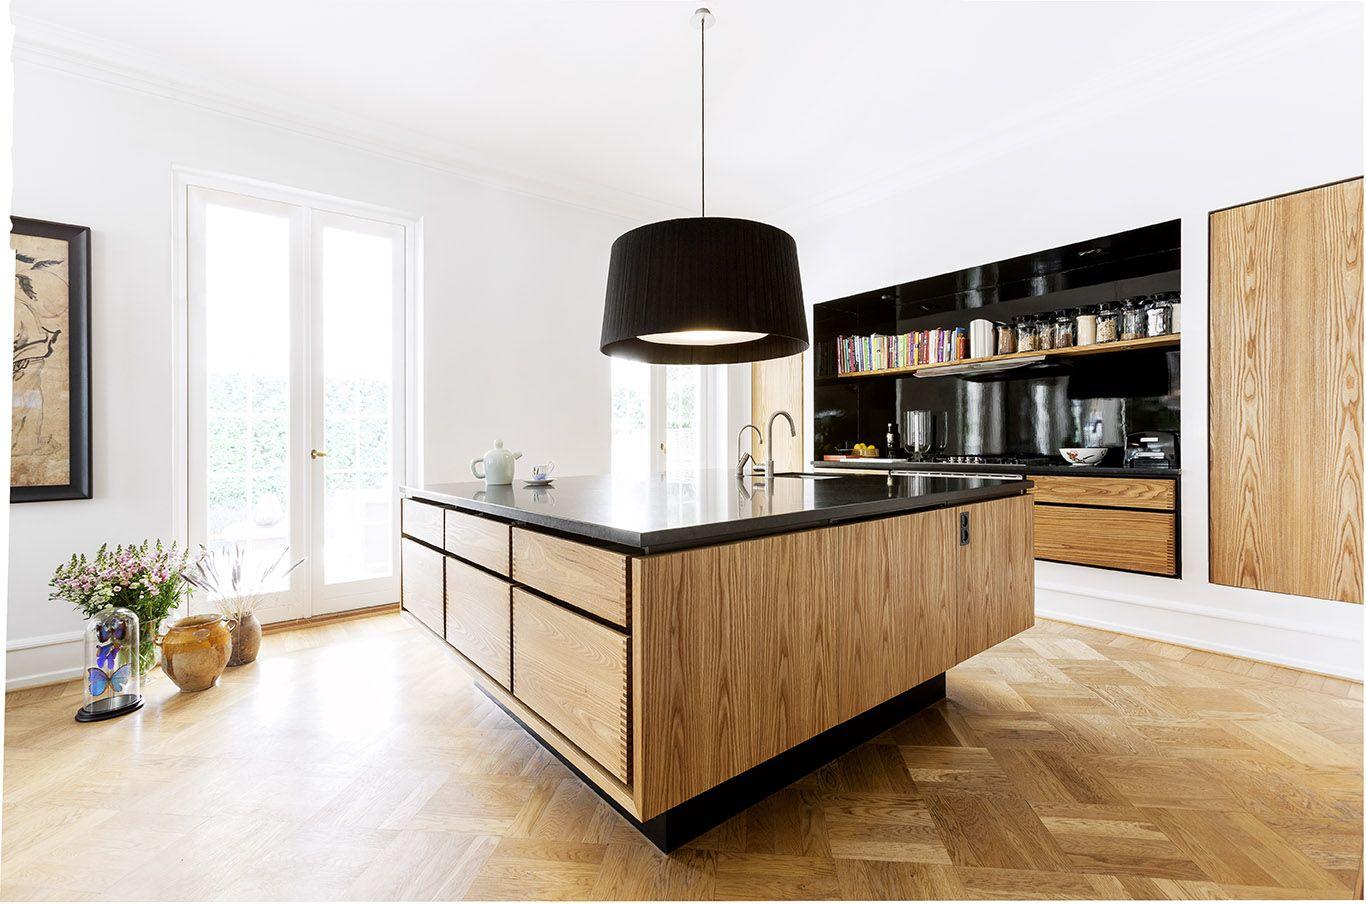 Best Scandinavian Kitchen Design Modern And Wooden Touches 400 x 300